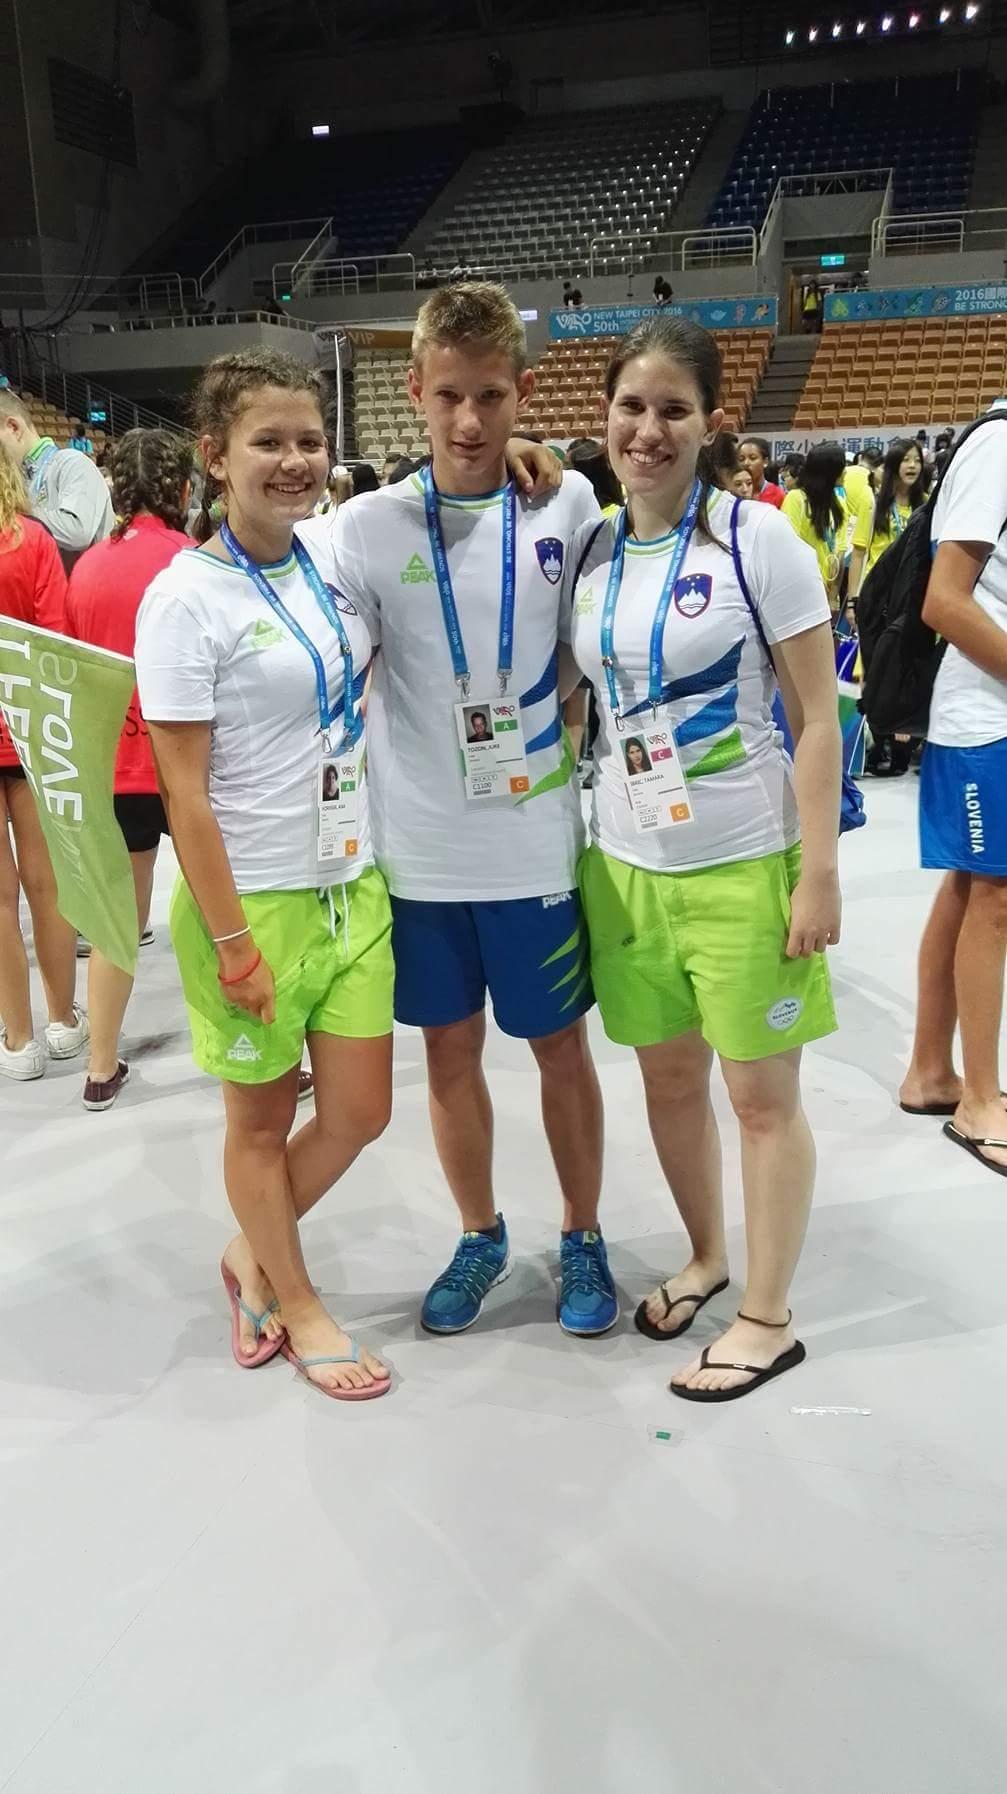 Člani taekwondo ekipe od leve Ana Vornšek, Jure Tozon in trenerka Tamara Ibrić